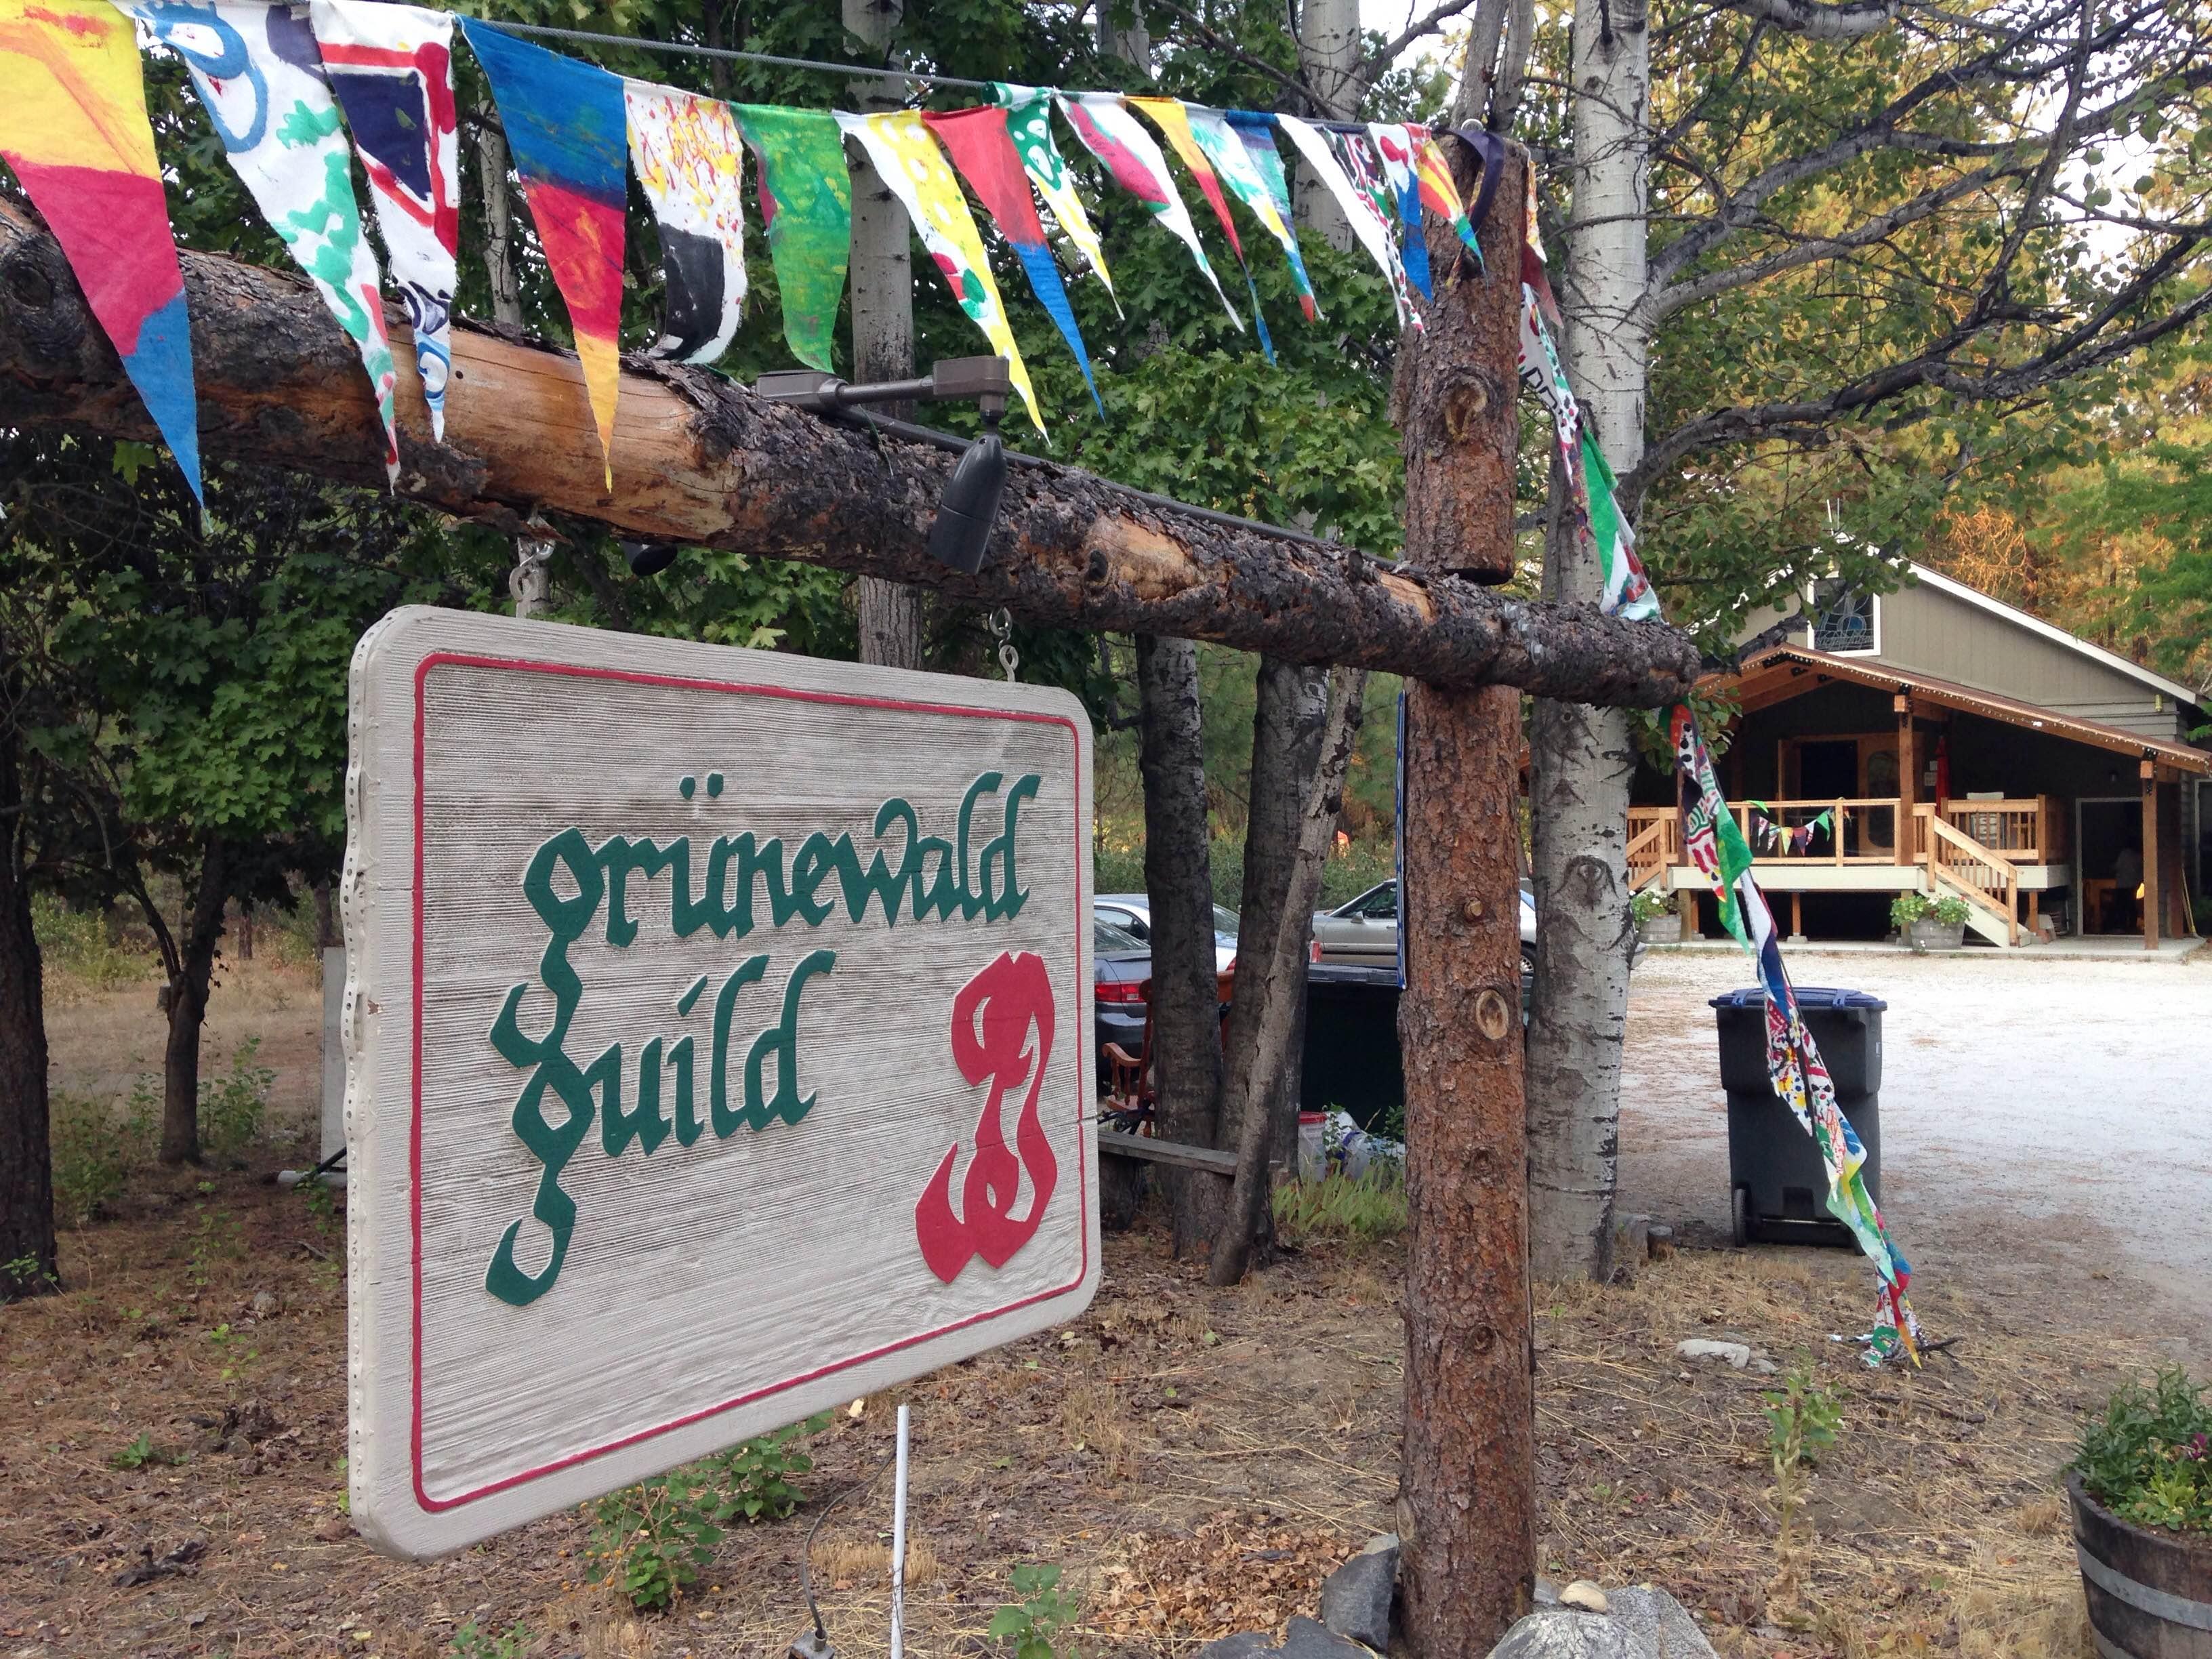 Grunewald Guild